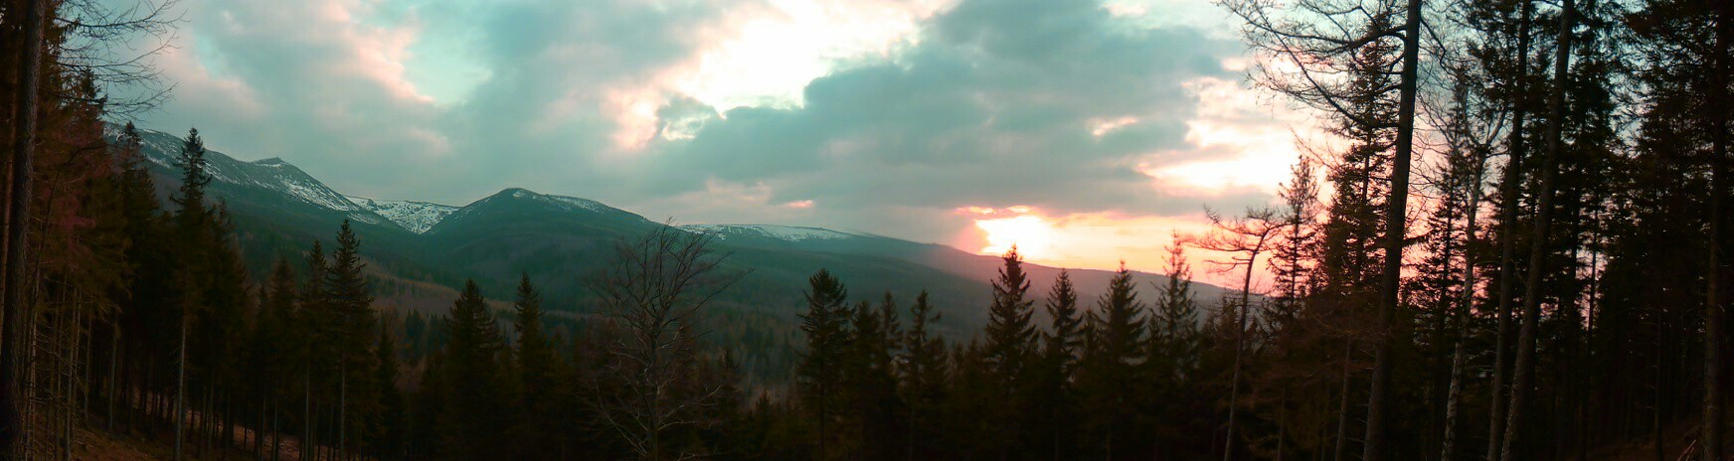 Karkonosze - cyan sunset by norijoko